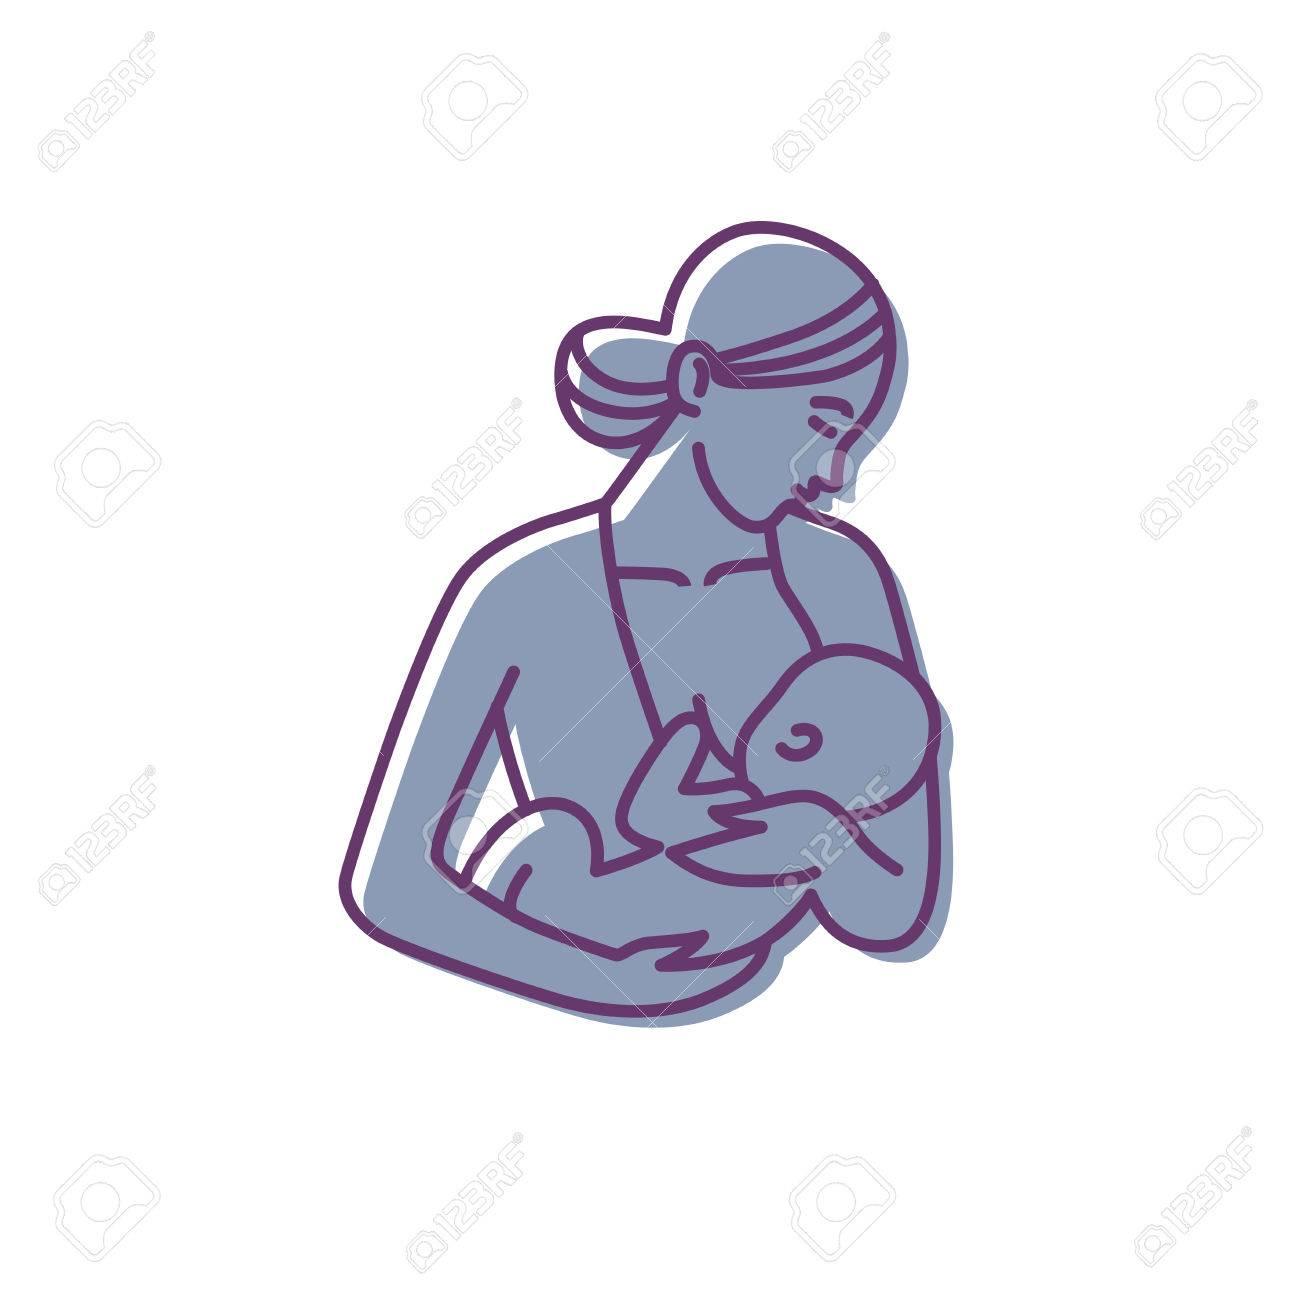 breastfeeding, mother and baby logo. vector motherhood icon - 84812298